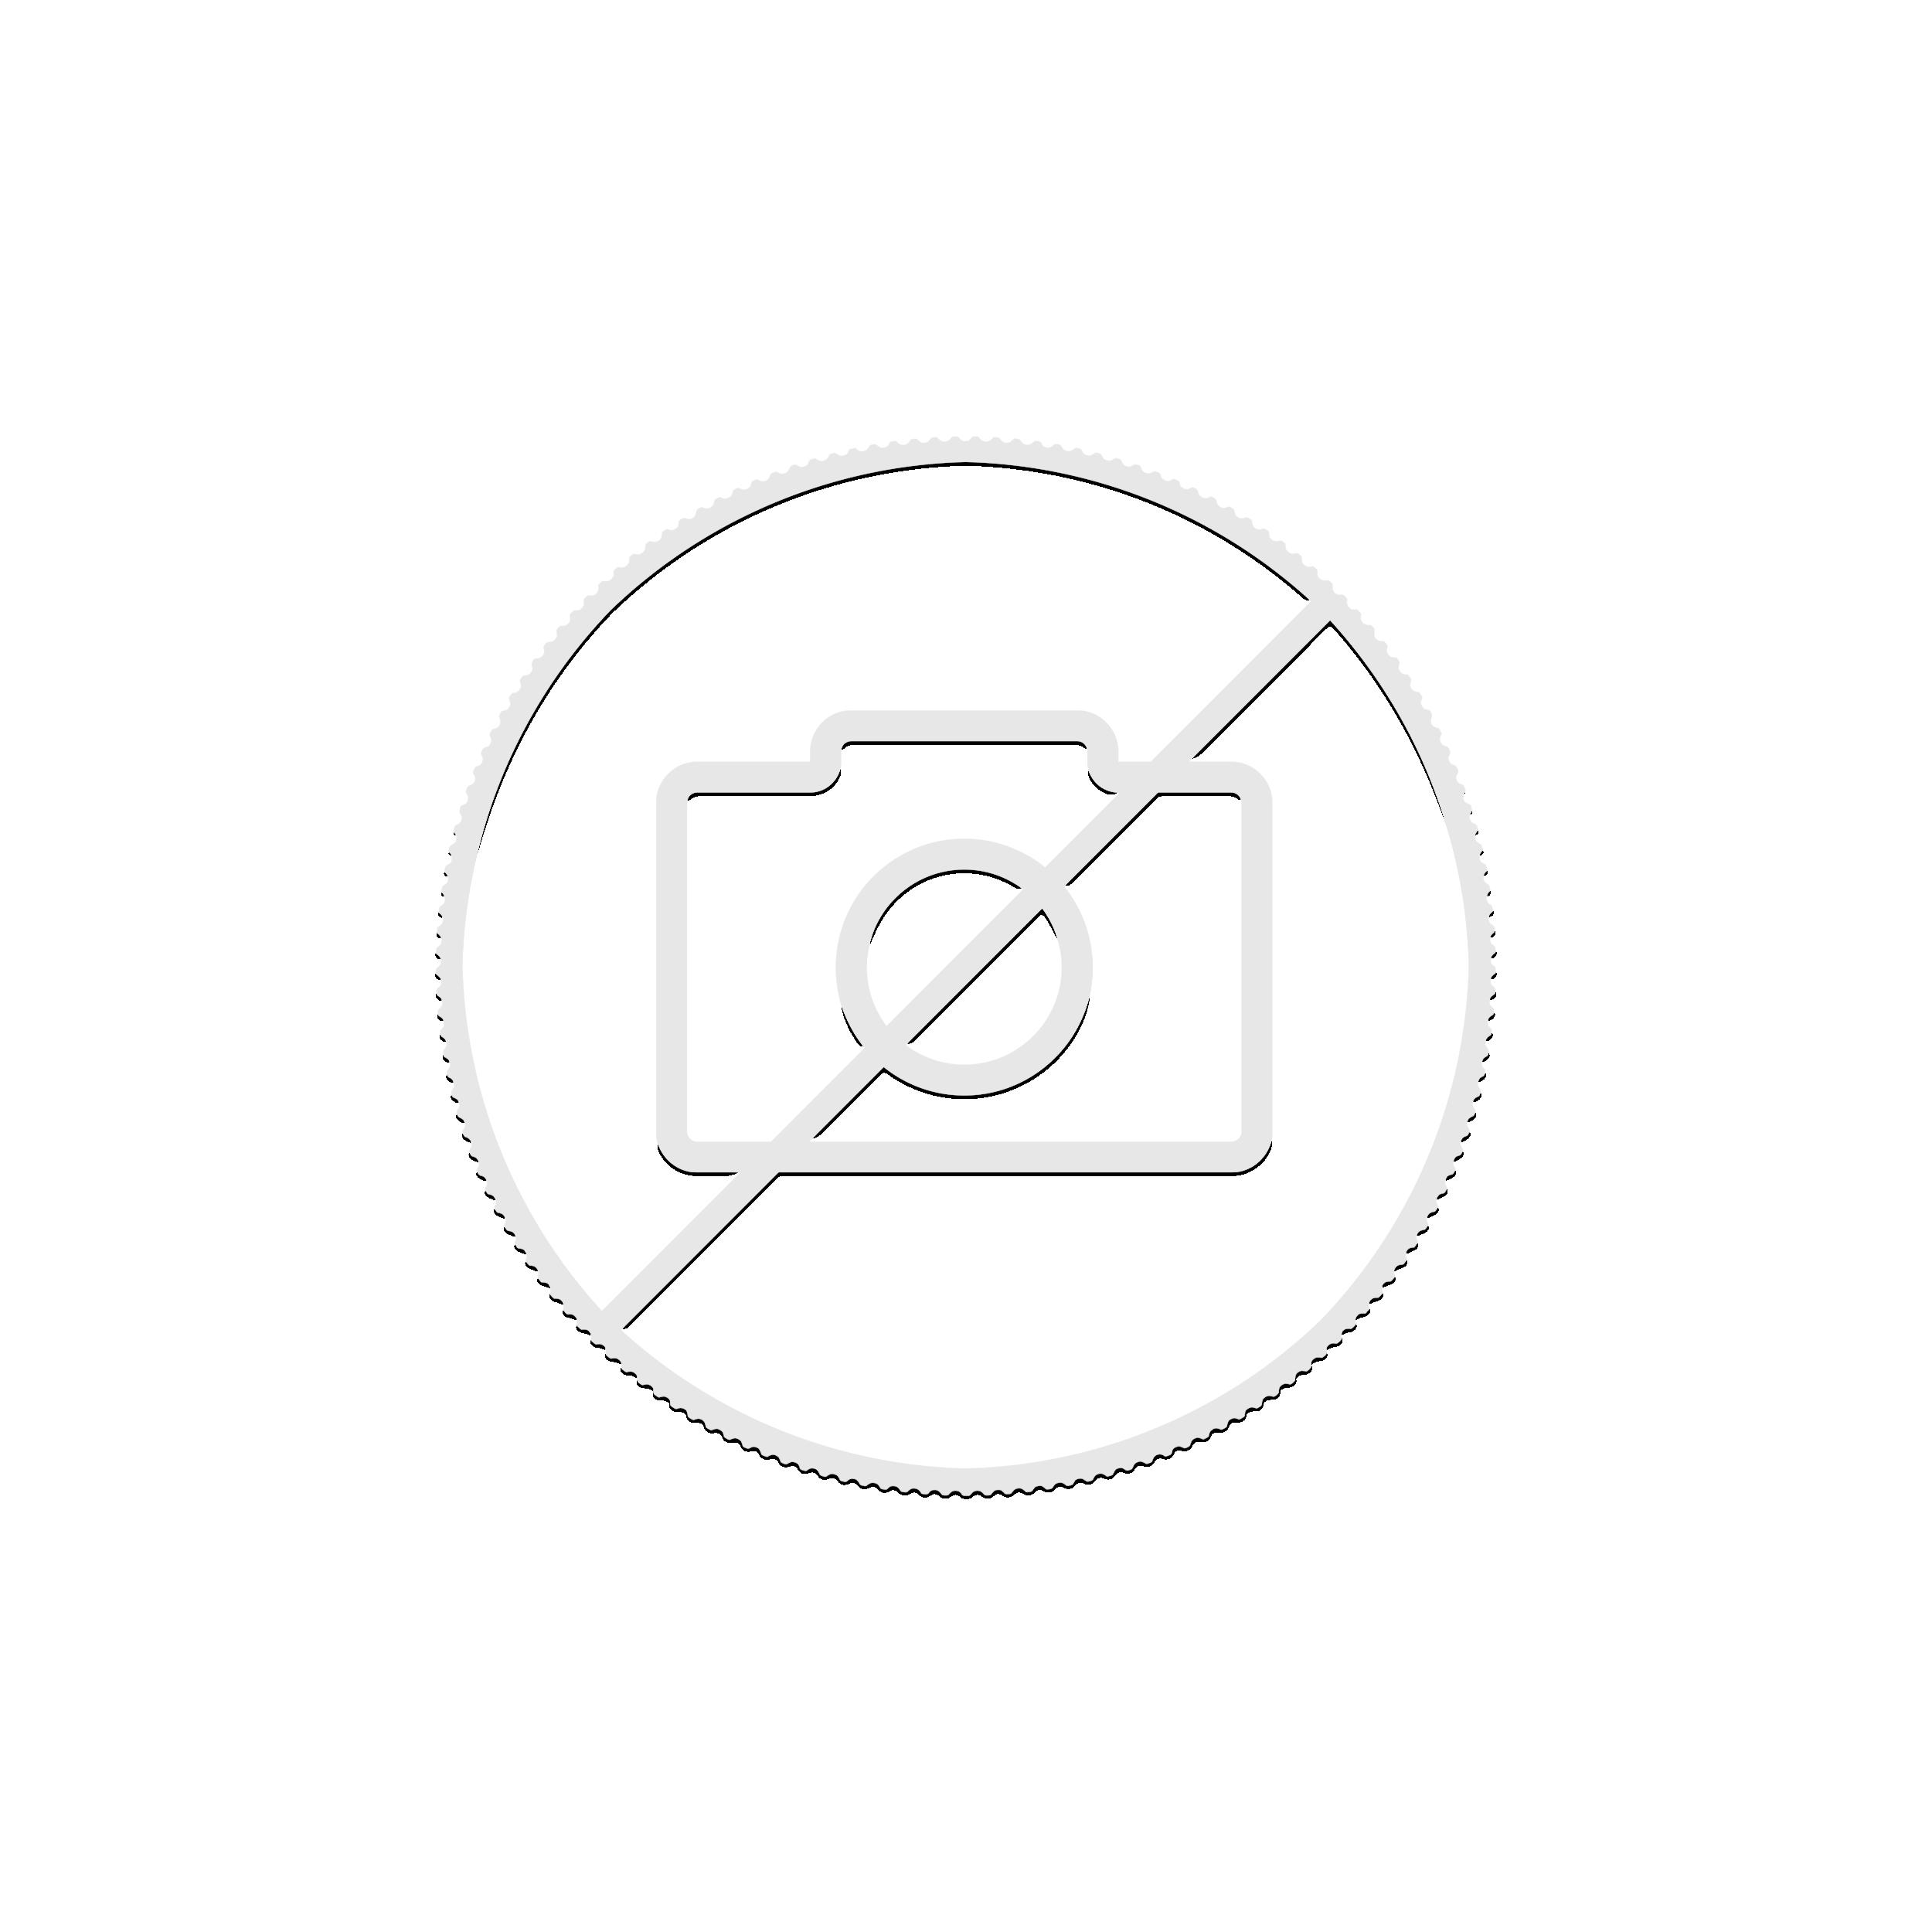 1 troy ounce zilveren munt Britannia 2018